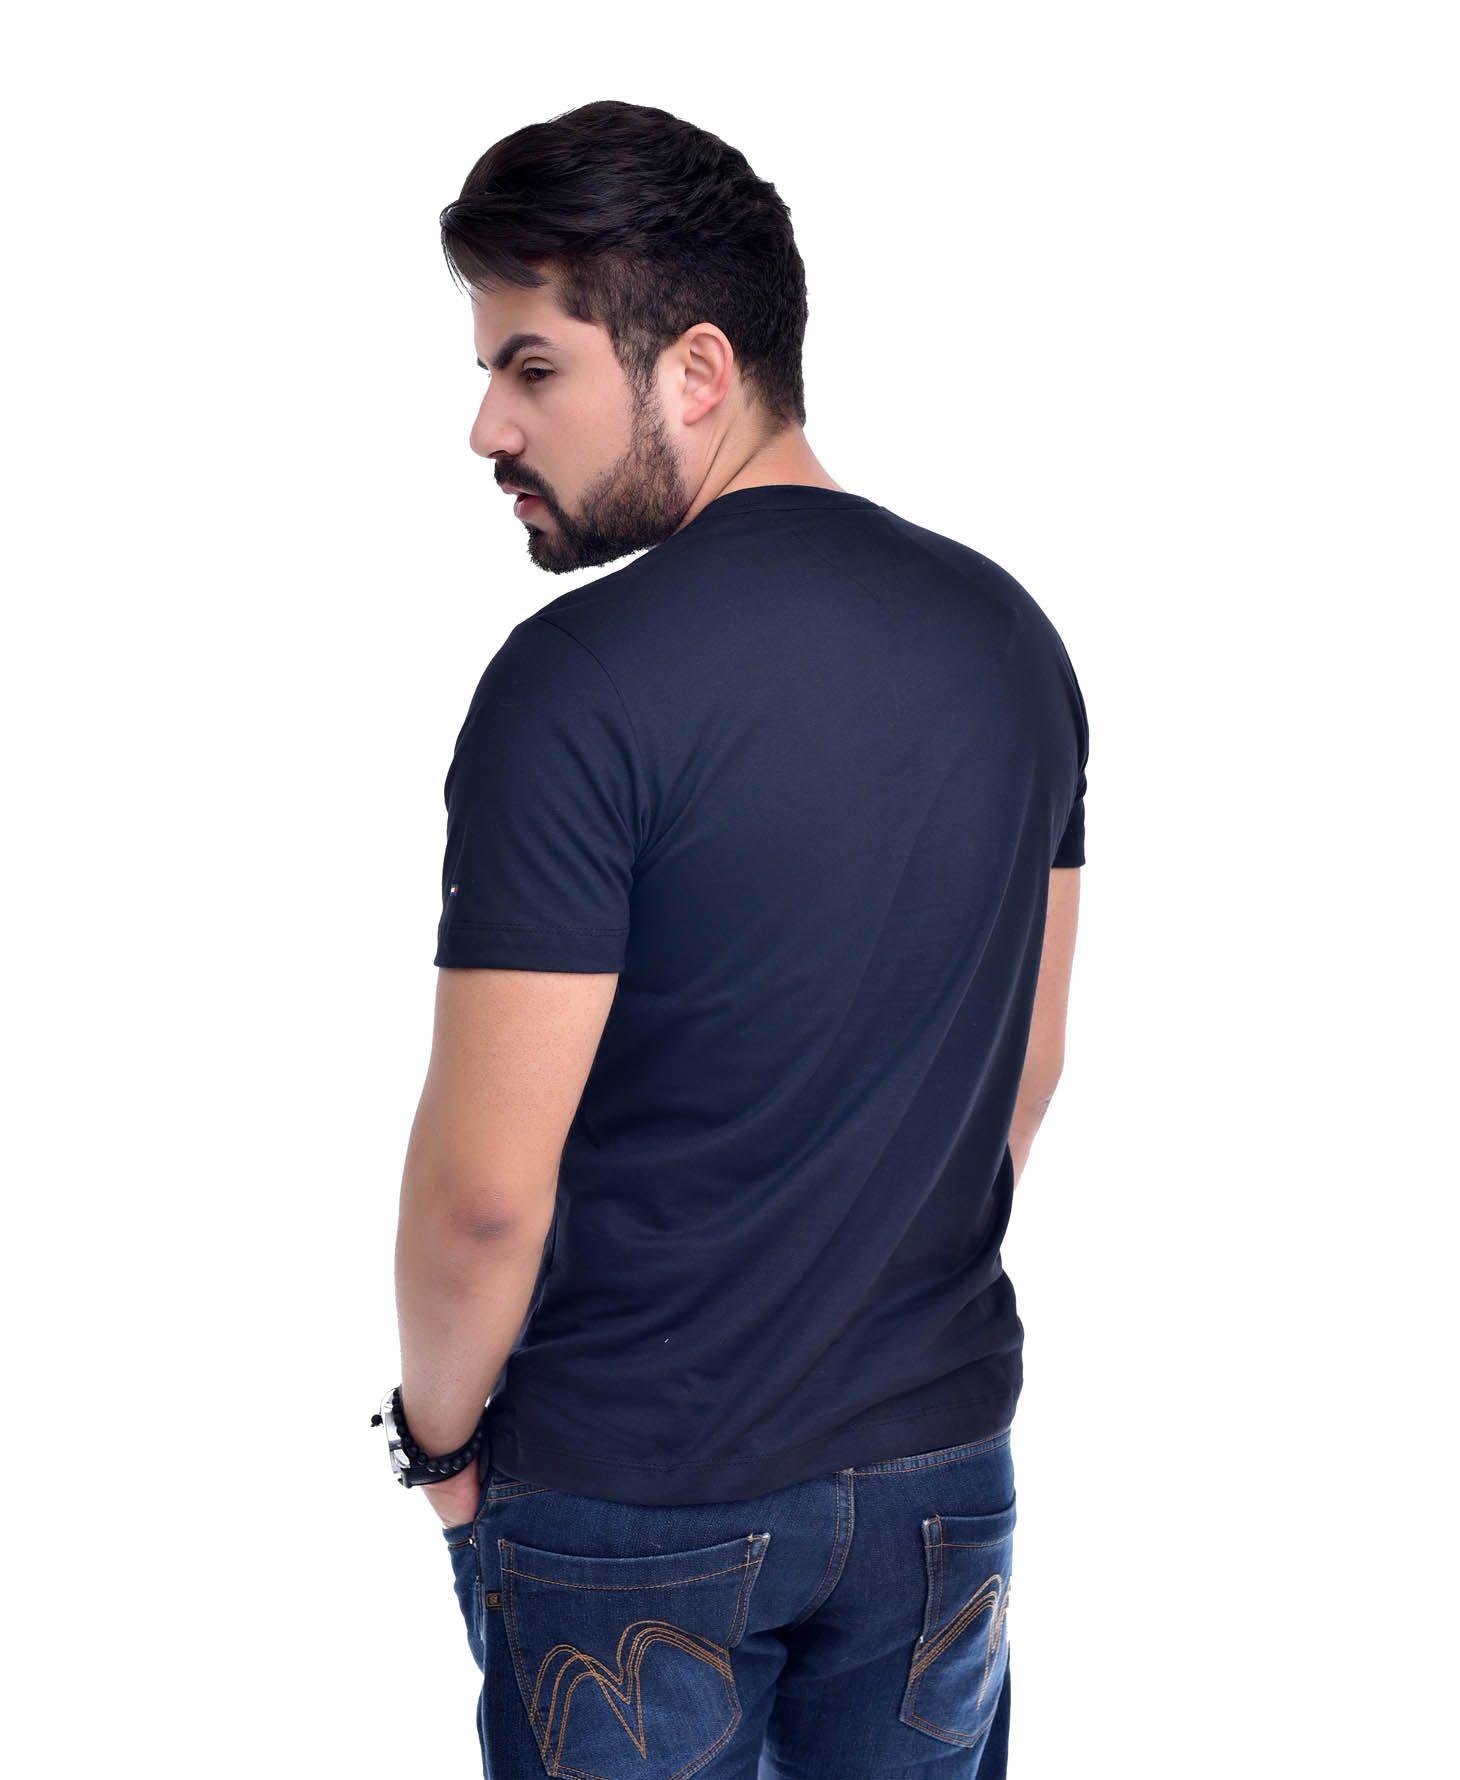 Camiseta Bolso Th Preta / Pta  - Ca Brasileira